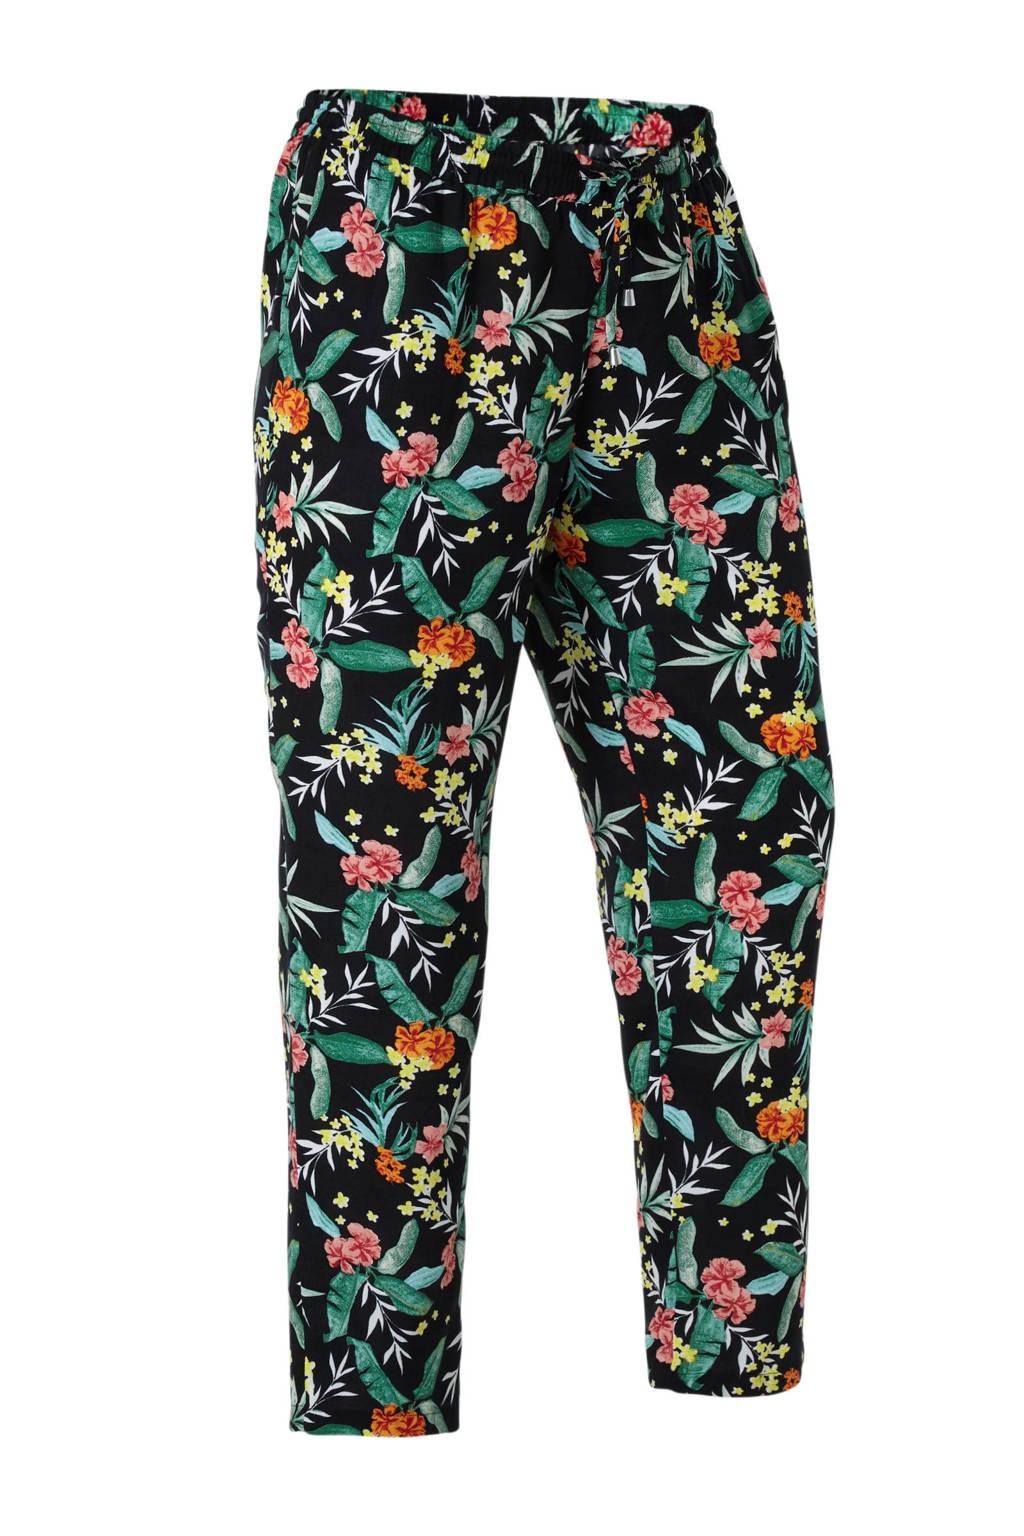 C&A XL Yessica loose fit broek met bladprint zwart, Zwart